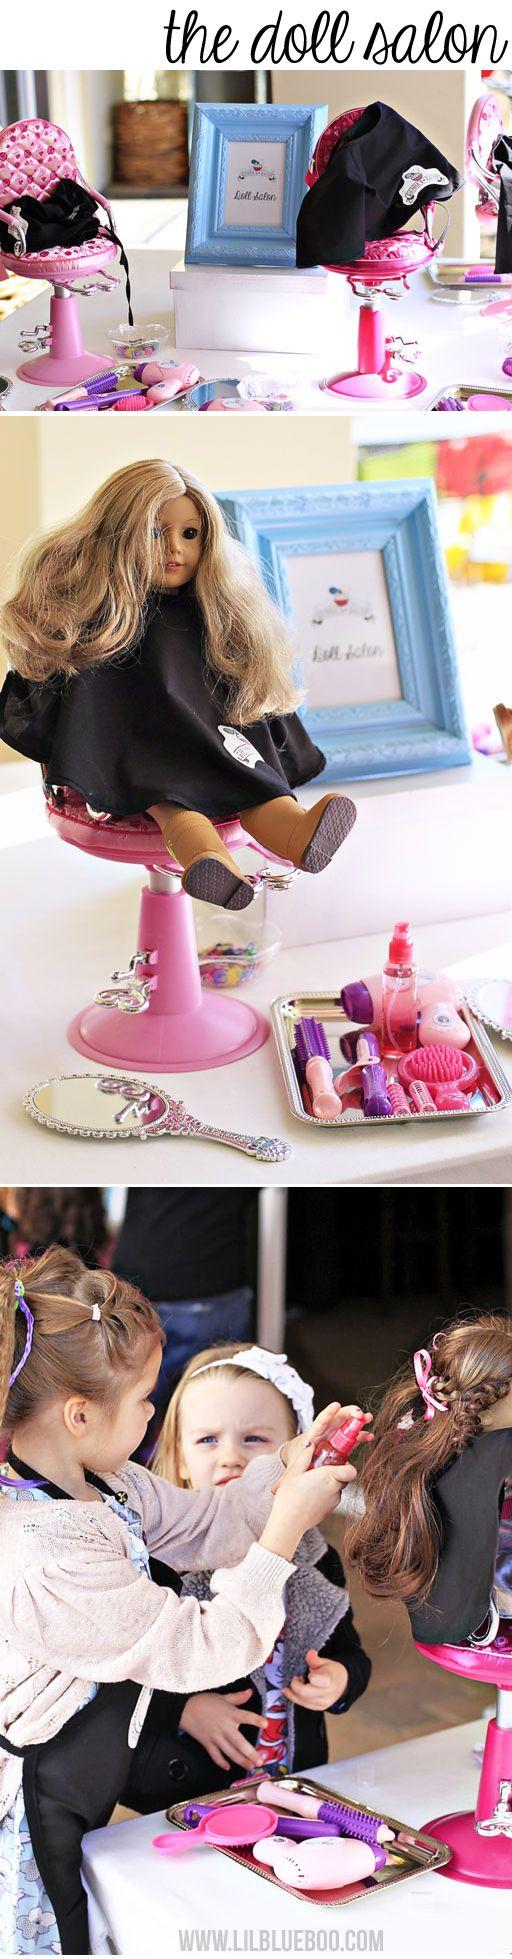 American Girl Sized Salon Party Station via lilblueboo.com #americangirl #party #diy